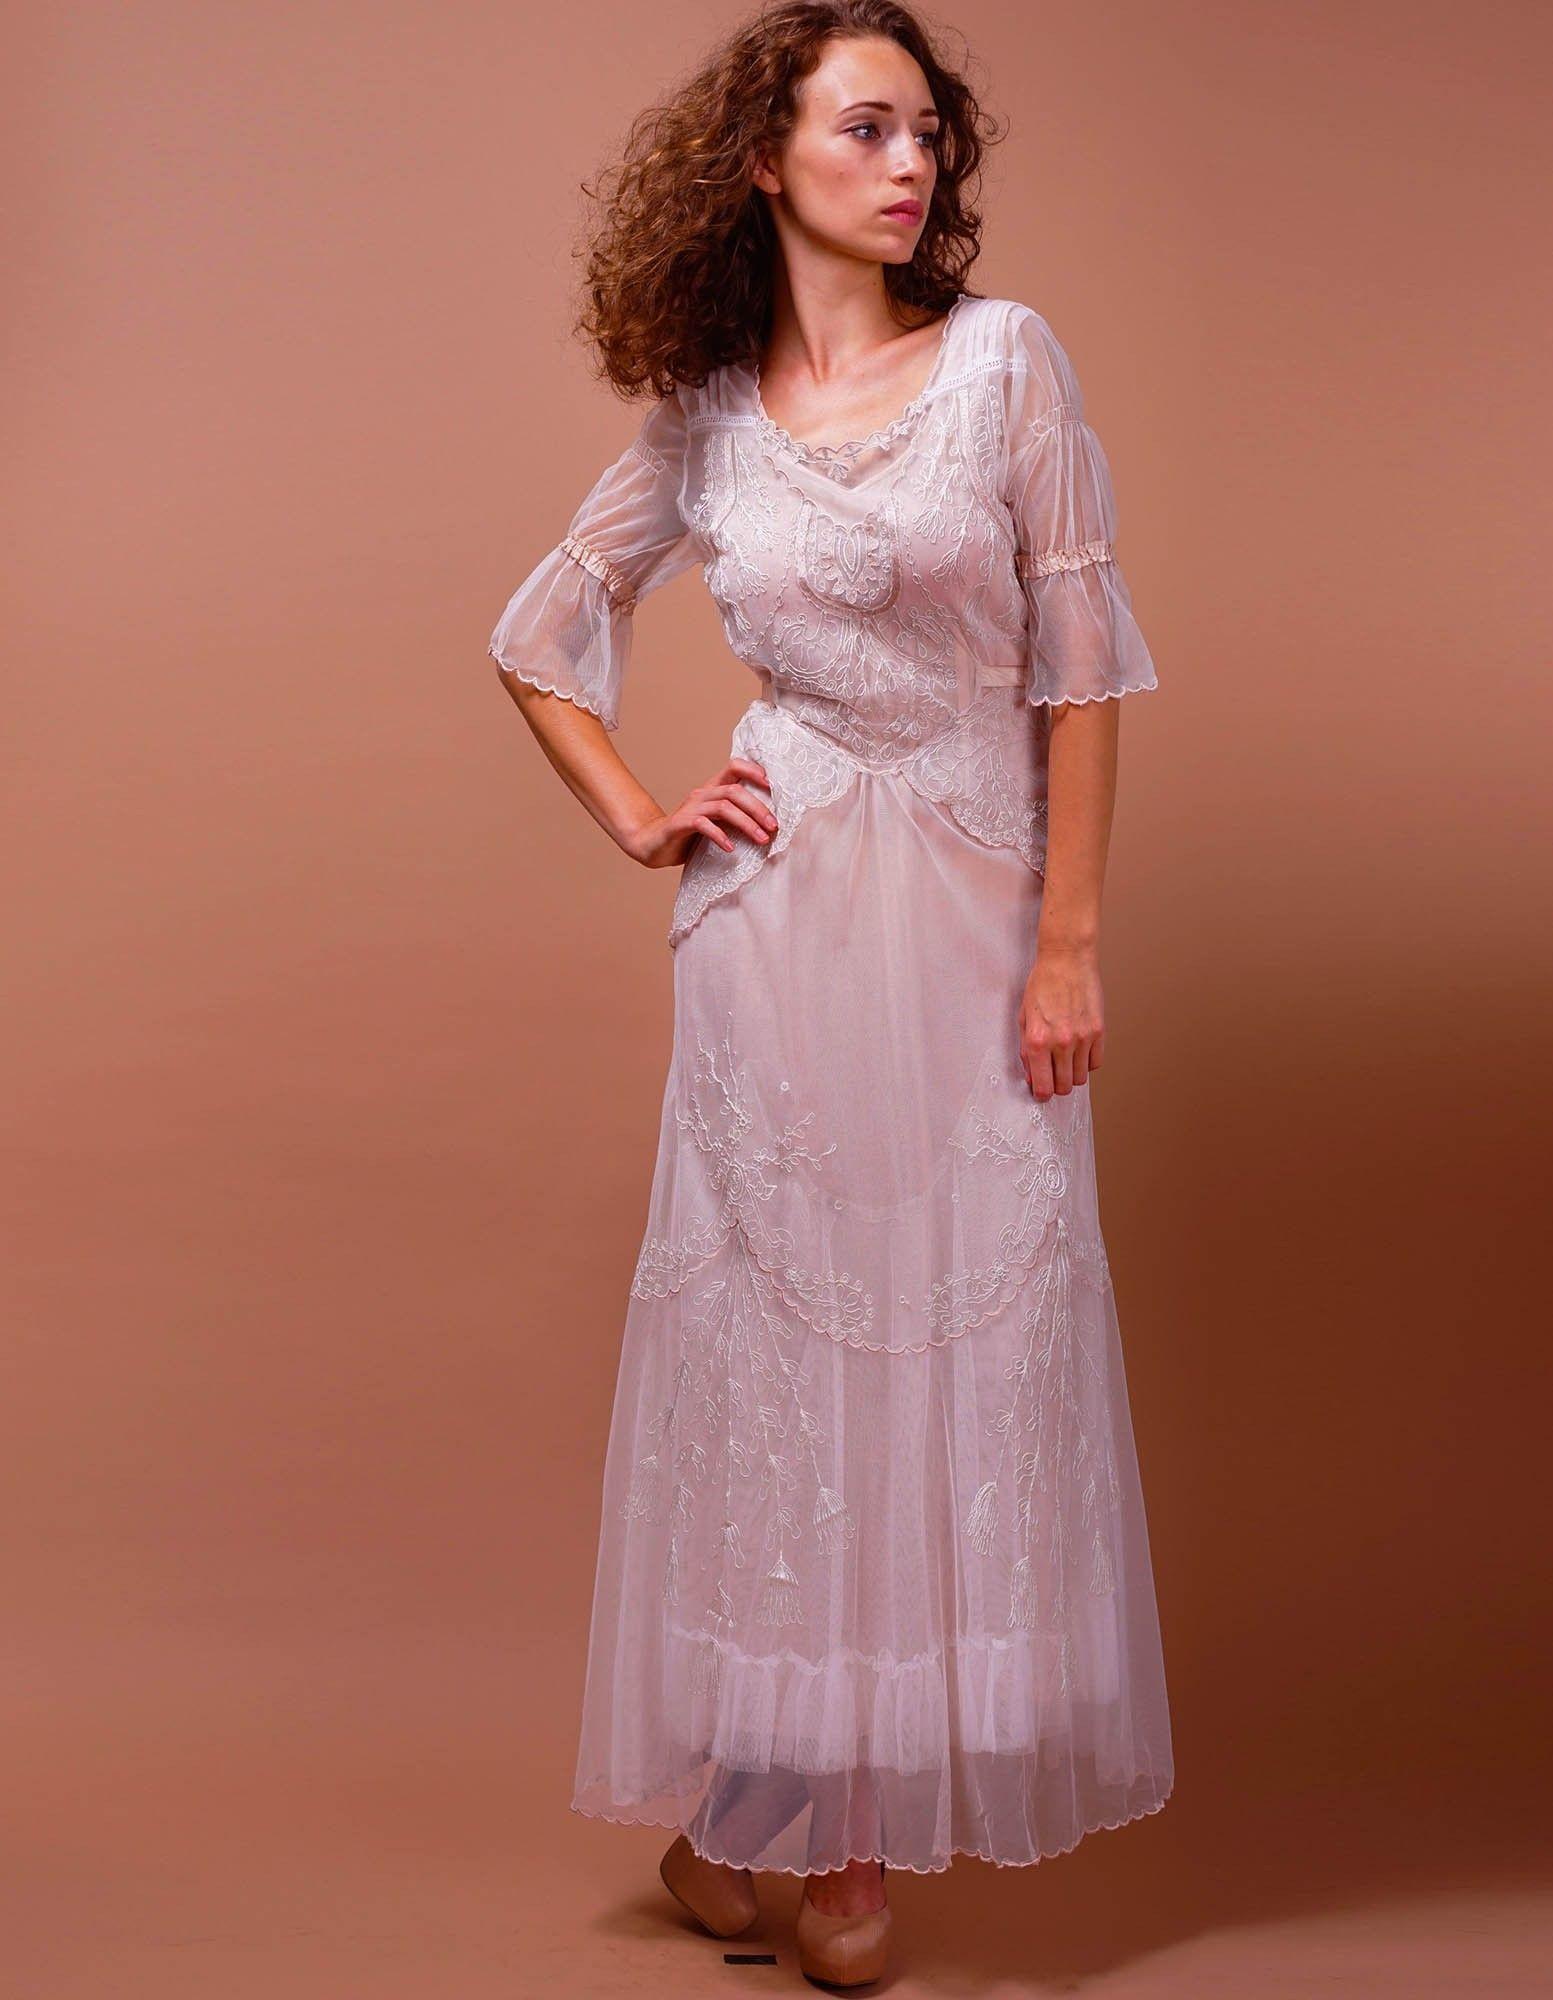 Vitange Wedding Dresses | Vintage Style Mother of the Bride Dresses ...